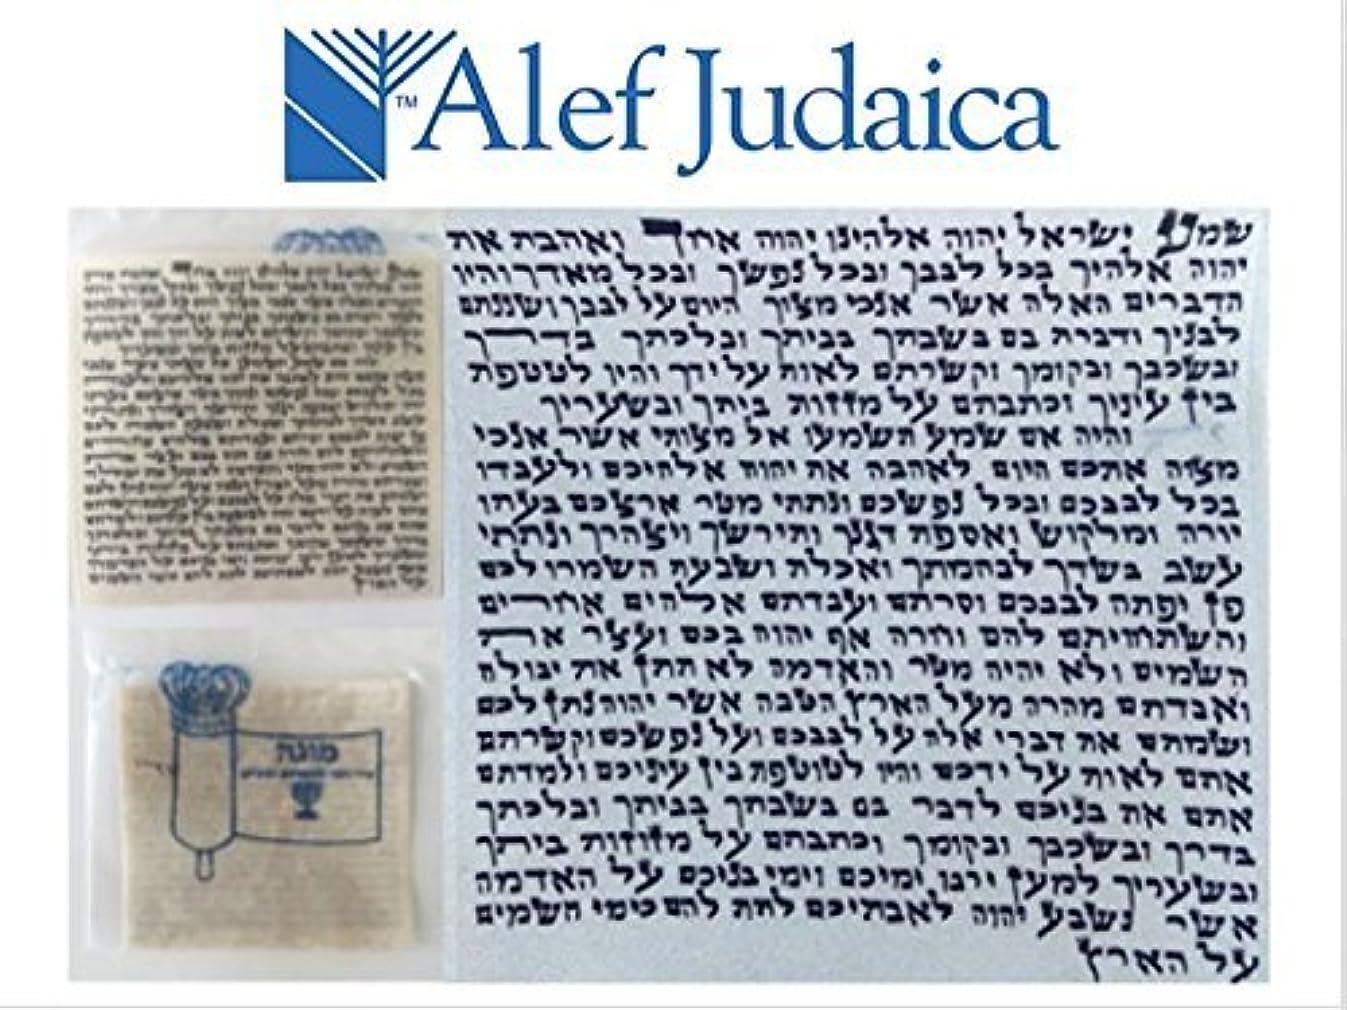 Alef Judaica Premier Quality Strict Kosher Mehadrin Mezuzah Scroll Parchment Klaff - 2.5 X 2.5 Inches